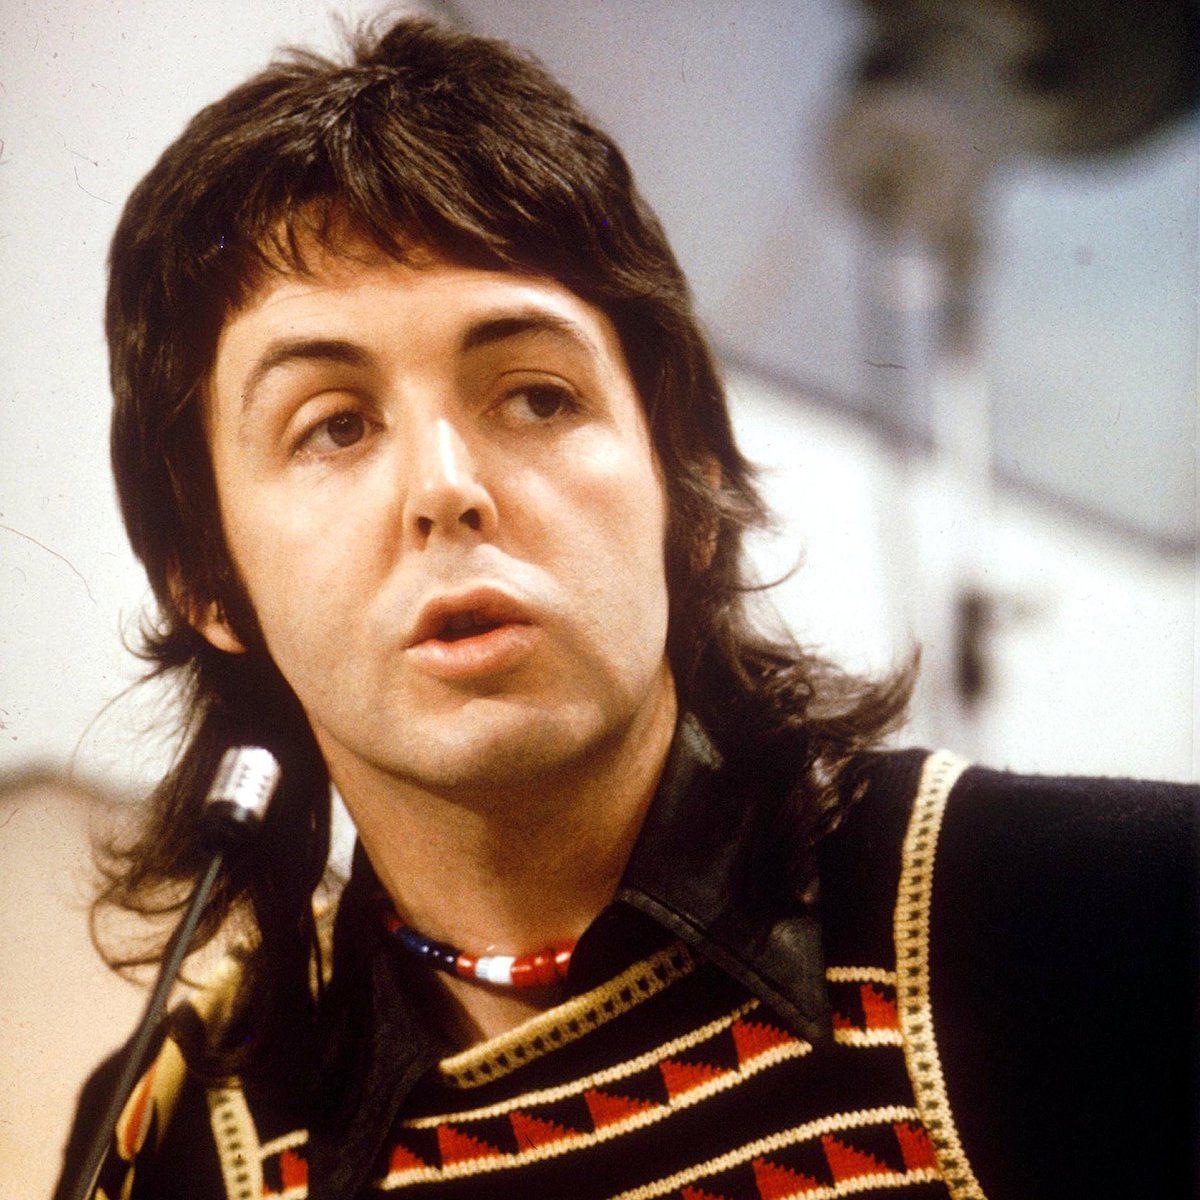 Mandatory Credit: Photo by David Dagley/Shutterstock (44607m) PAUL MCCARTNEY PAUL MCCARTNEY, WINGS - 1973